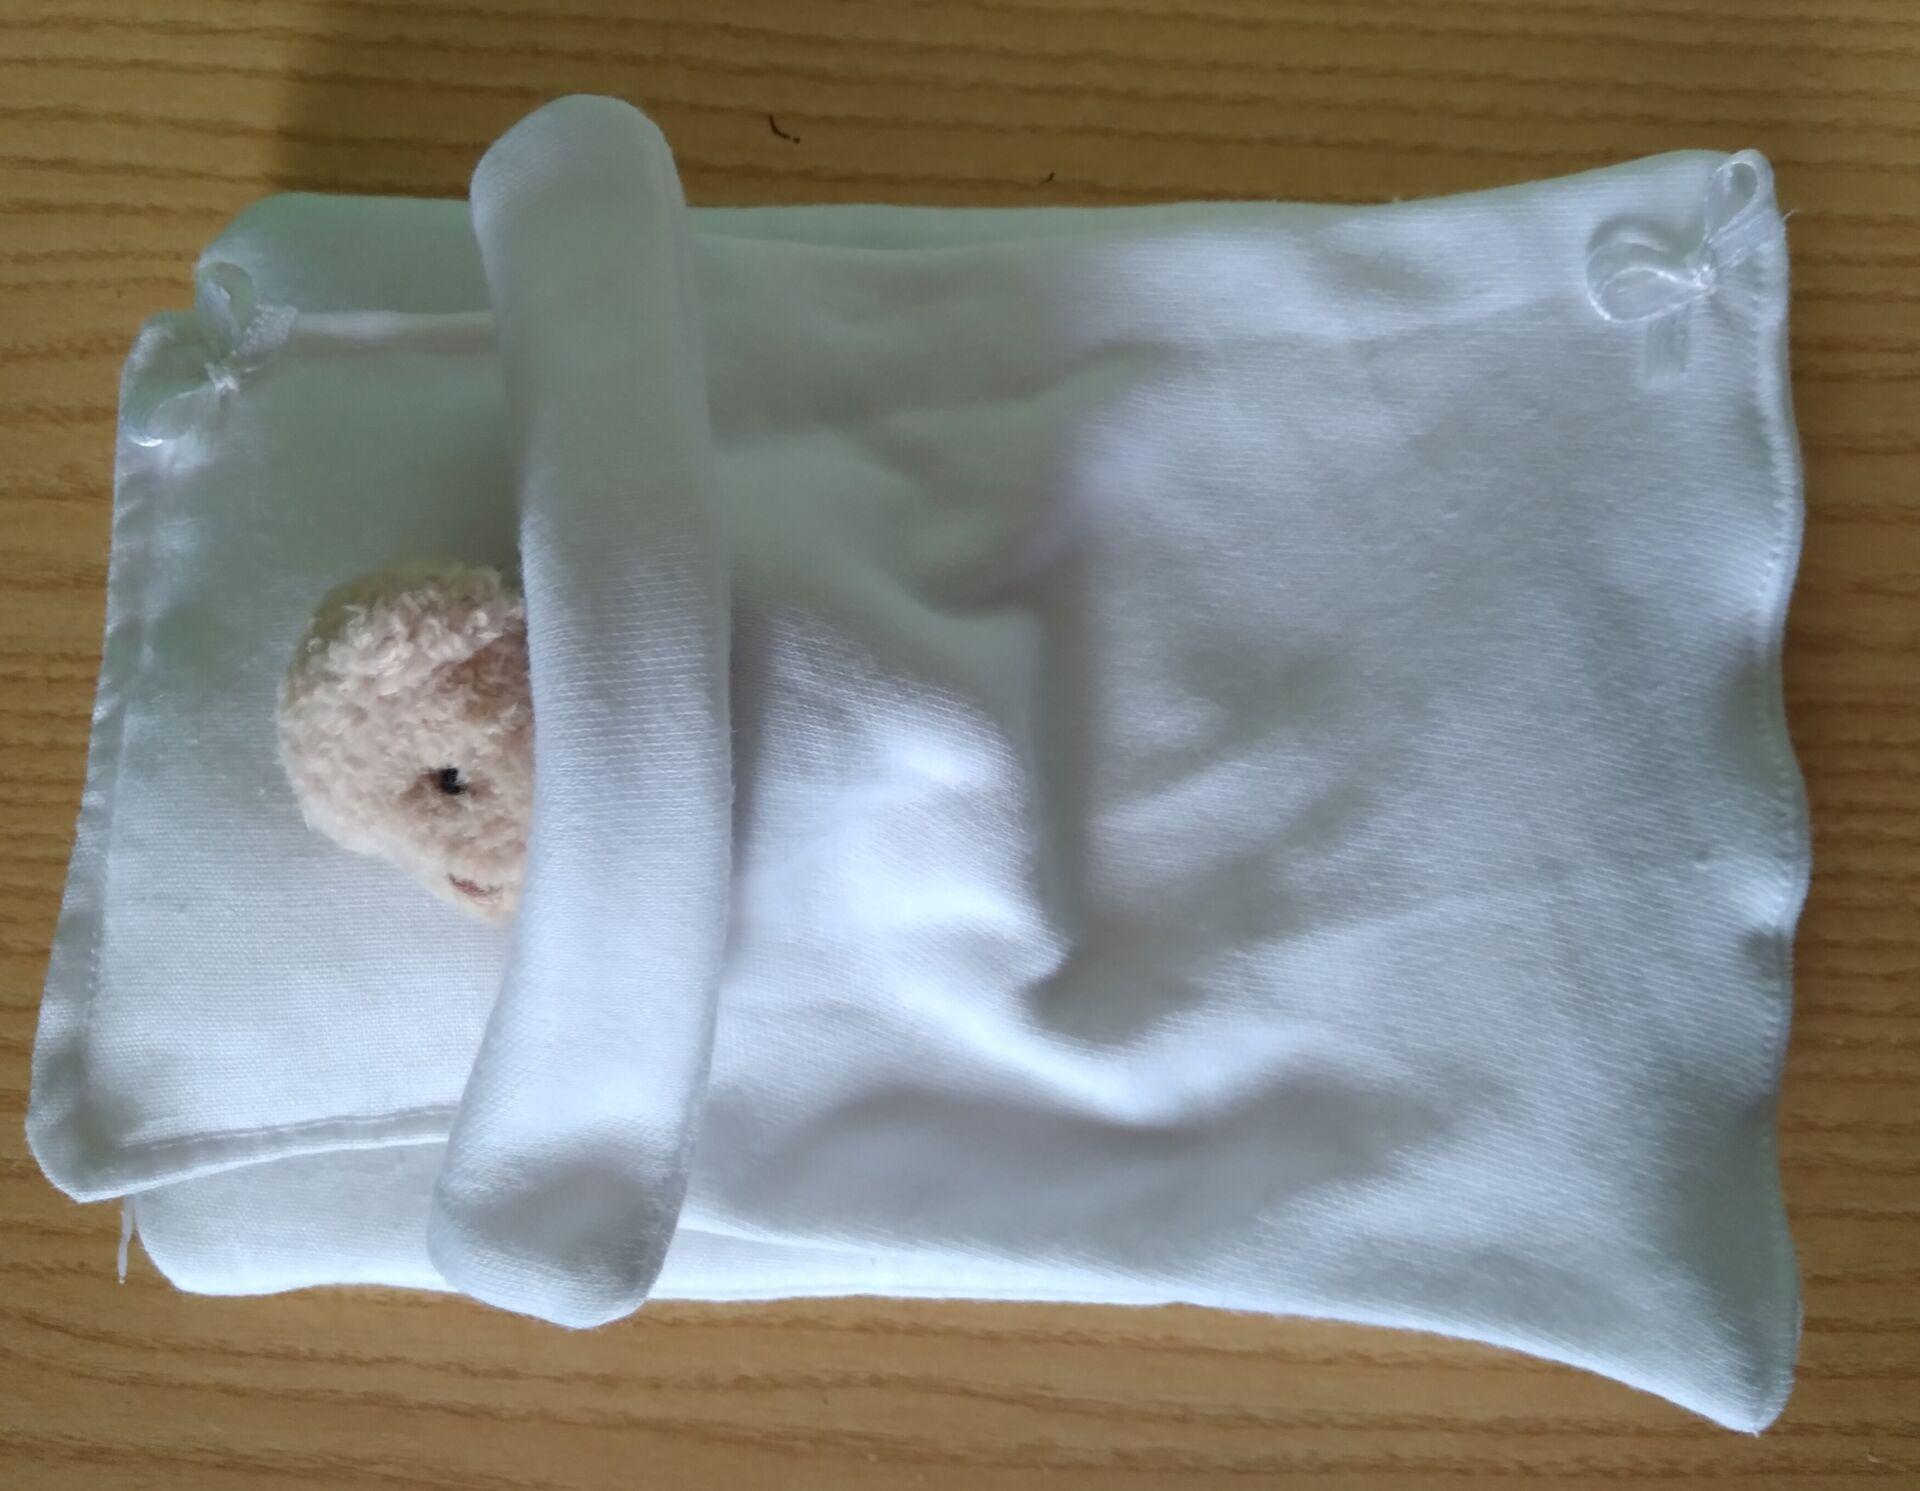 baby blankets baby burial quilt set coffin CRISP WHITE born 15-16 weeks